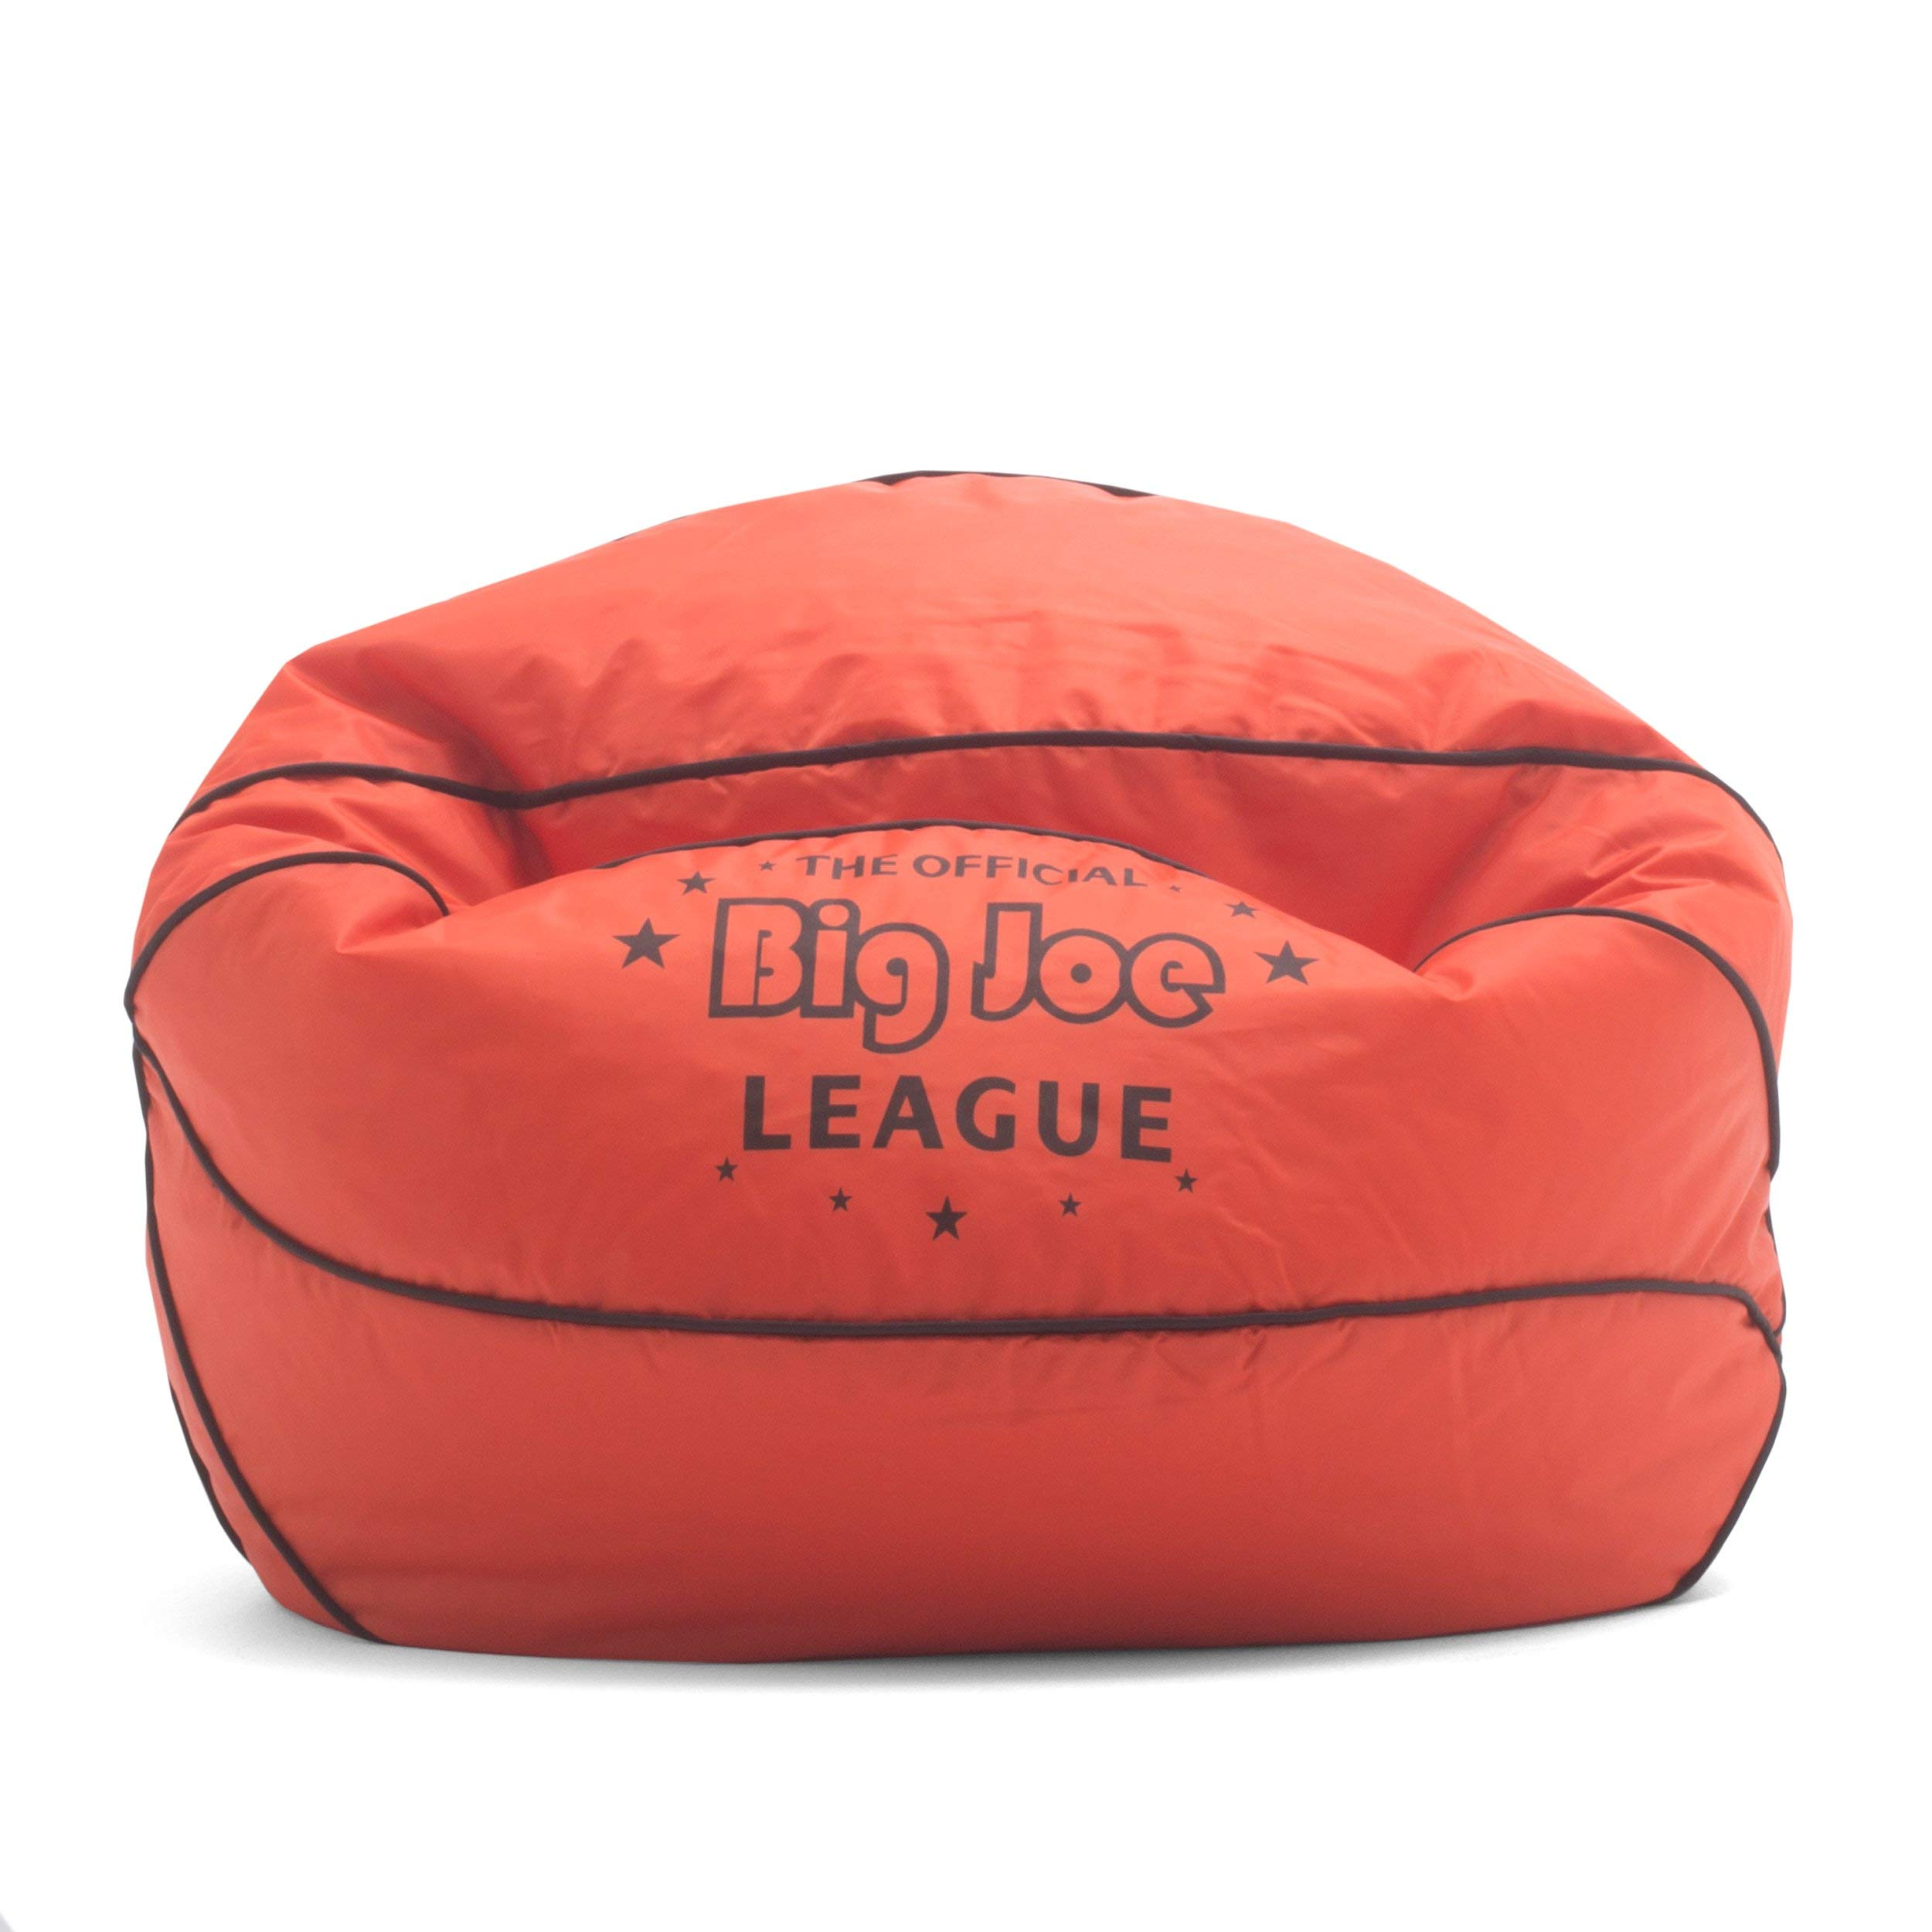 Comfort Research Big Joe Basketball Bean Bag With Smart